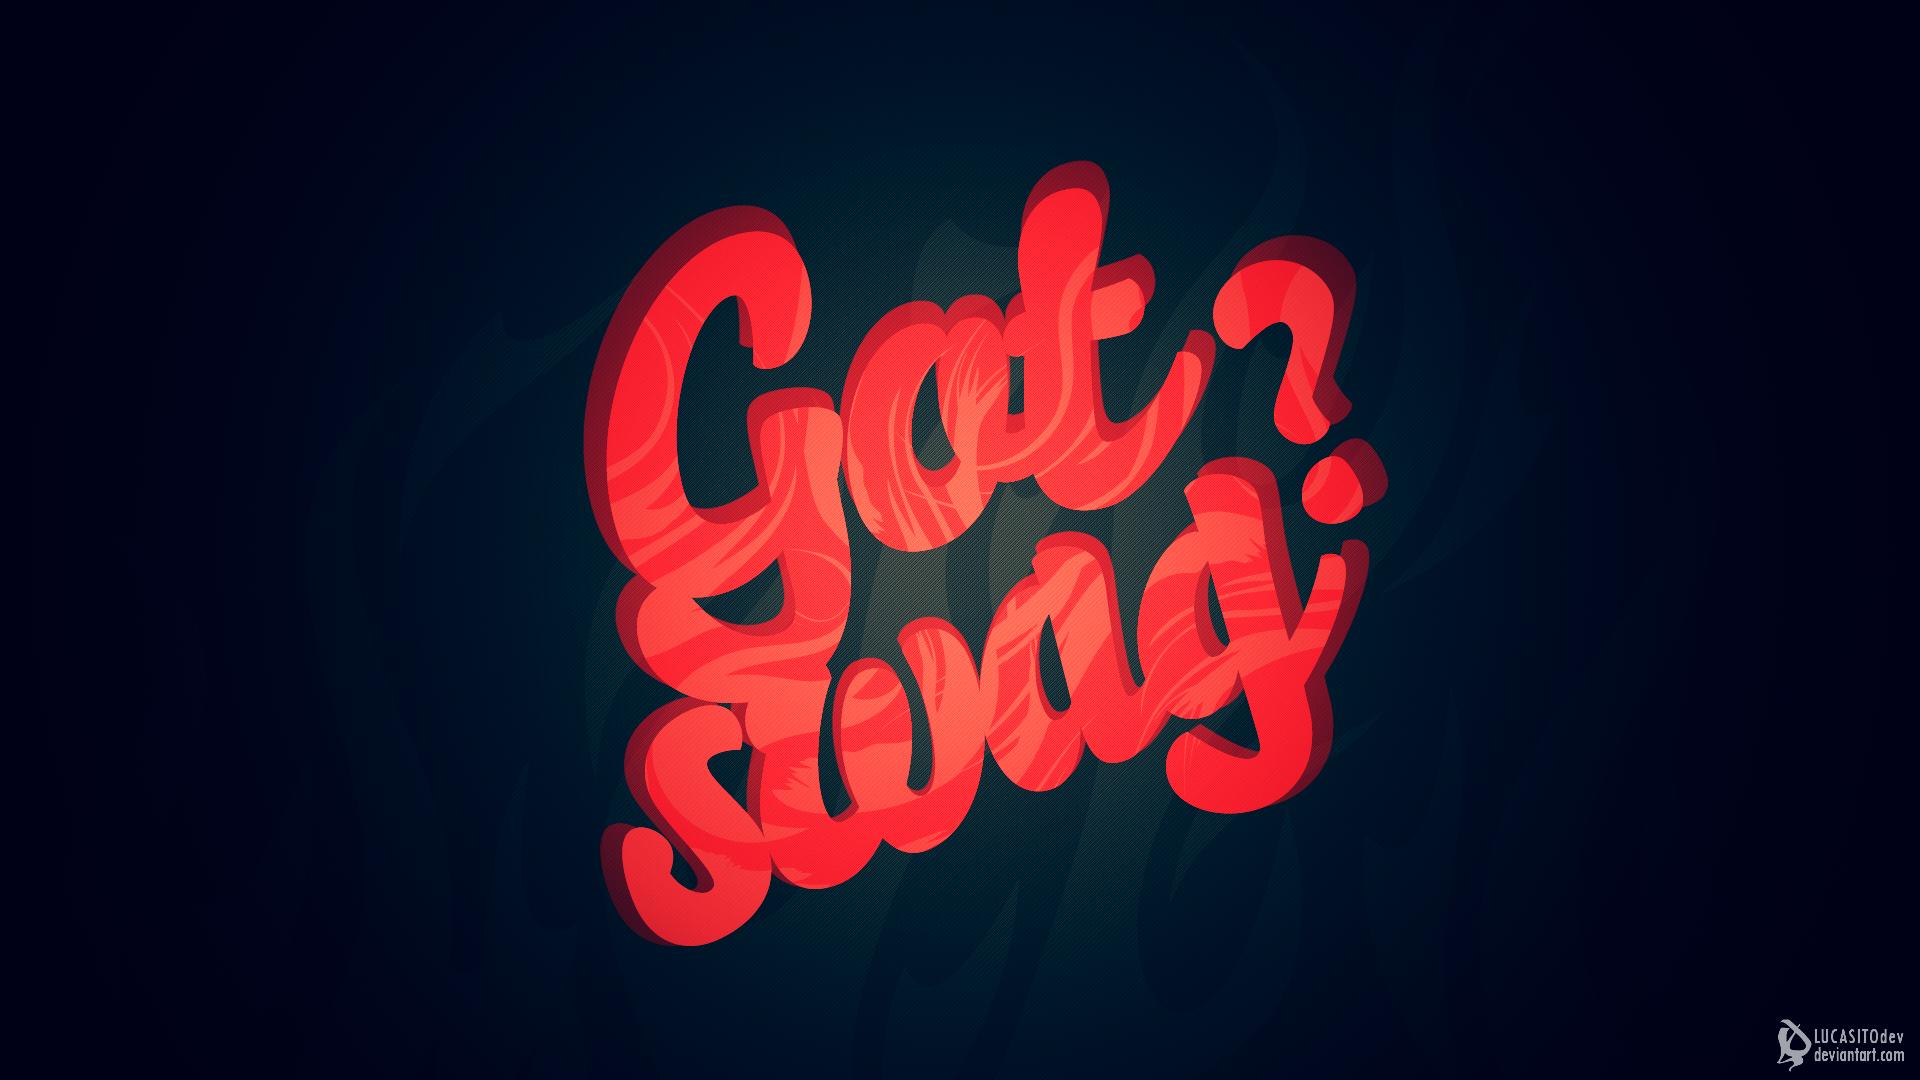 Cool Wallpaper Logo Swag - latest?cb\u003d20130821155515  Image_545395.png/revision/latest?cb\u003d20130821155515